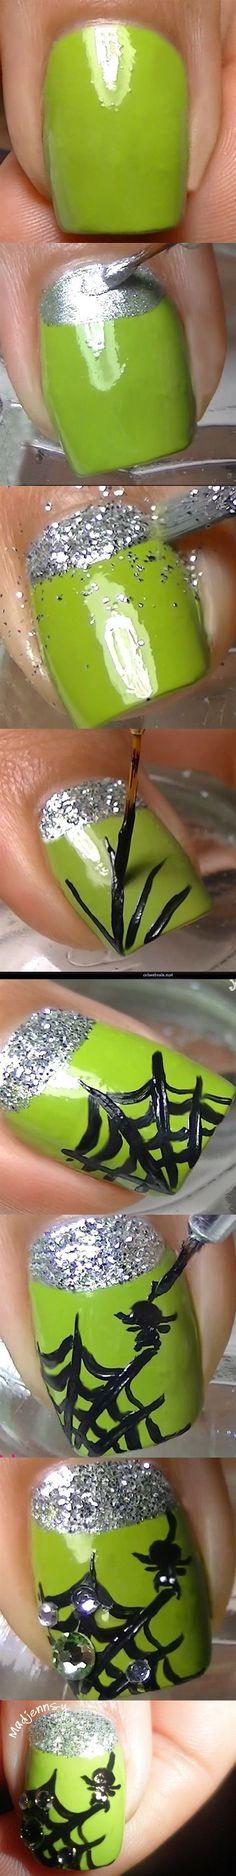 DIY Ideas Nails Art : Step-by-Step Nail Art Tutorials